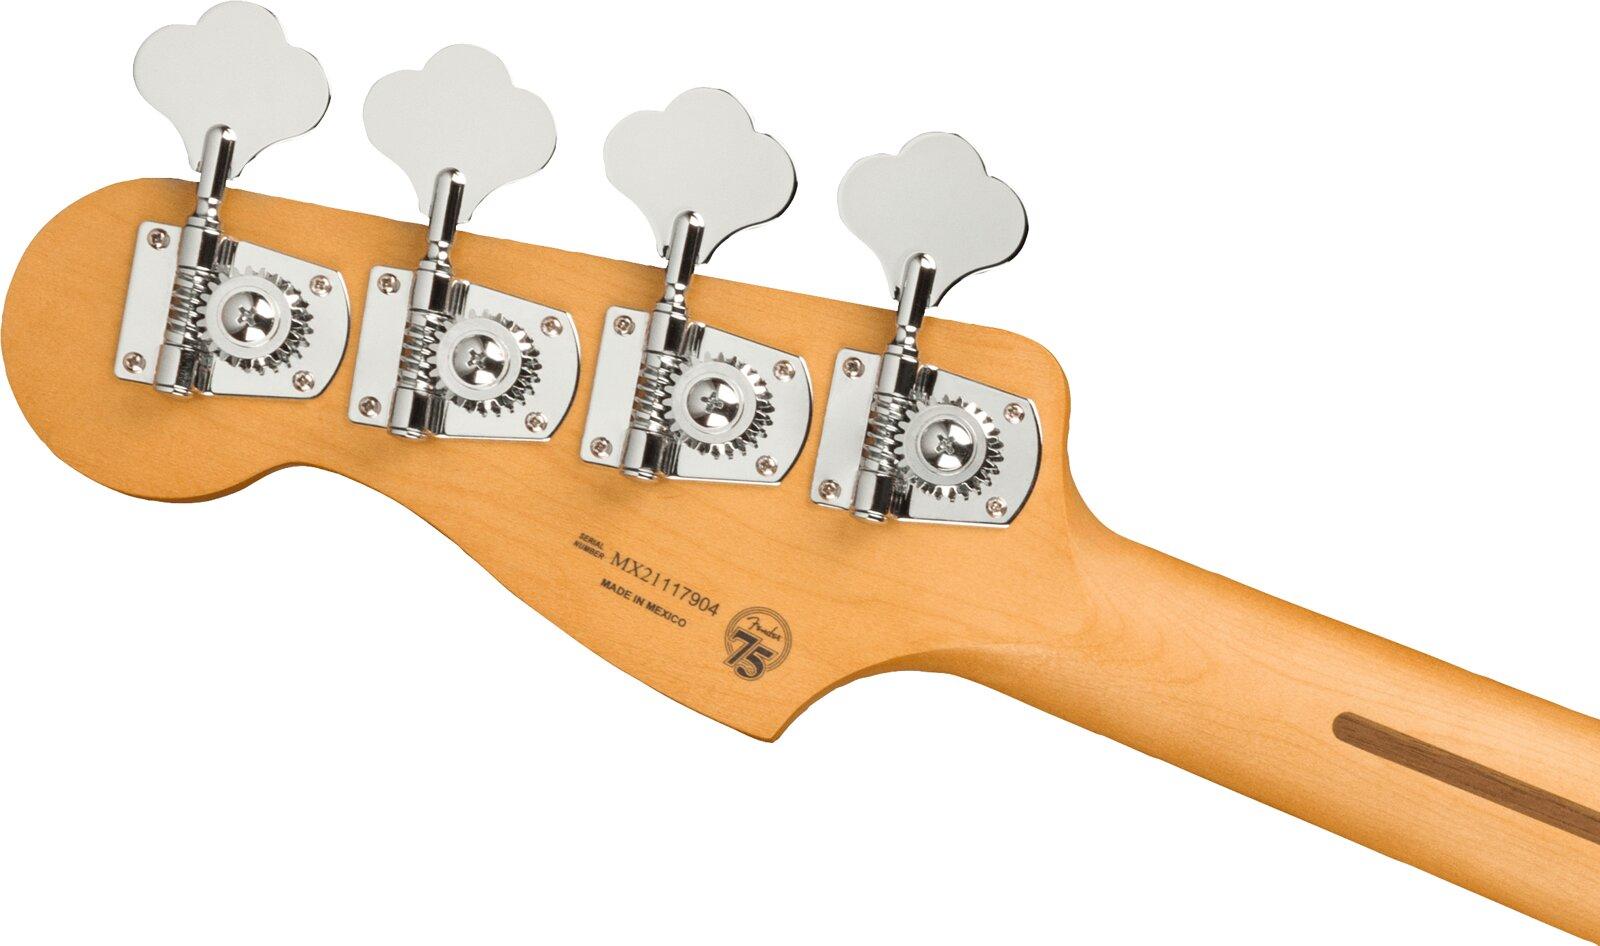 Fender Player Plus Precision Bass, Maple Fingerboard, Cosmic Jade : photo 4